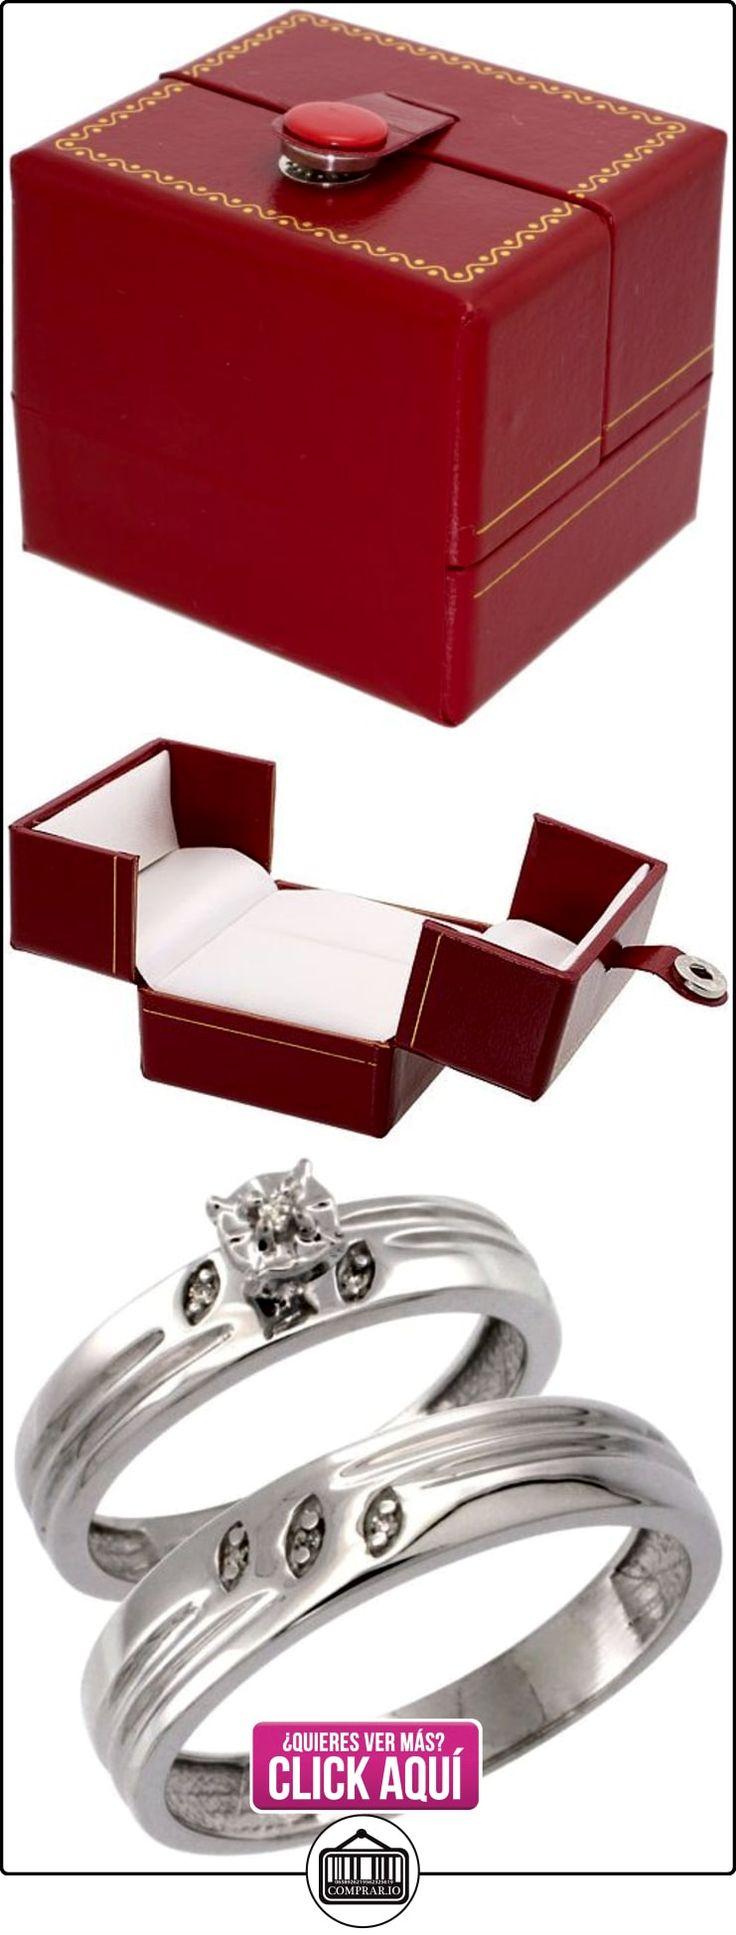 Revoni - Anillo de compromiso de oro blanco  ✿ Joyas para hombres especiales - lujo ✿ ▬► Ver oferta: http://comprar.io/goto/B005NWCL7K